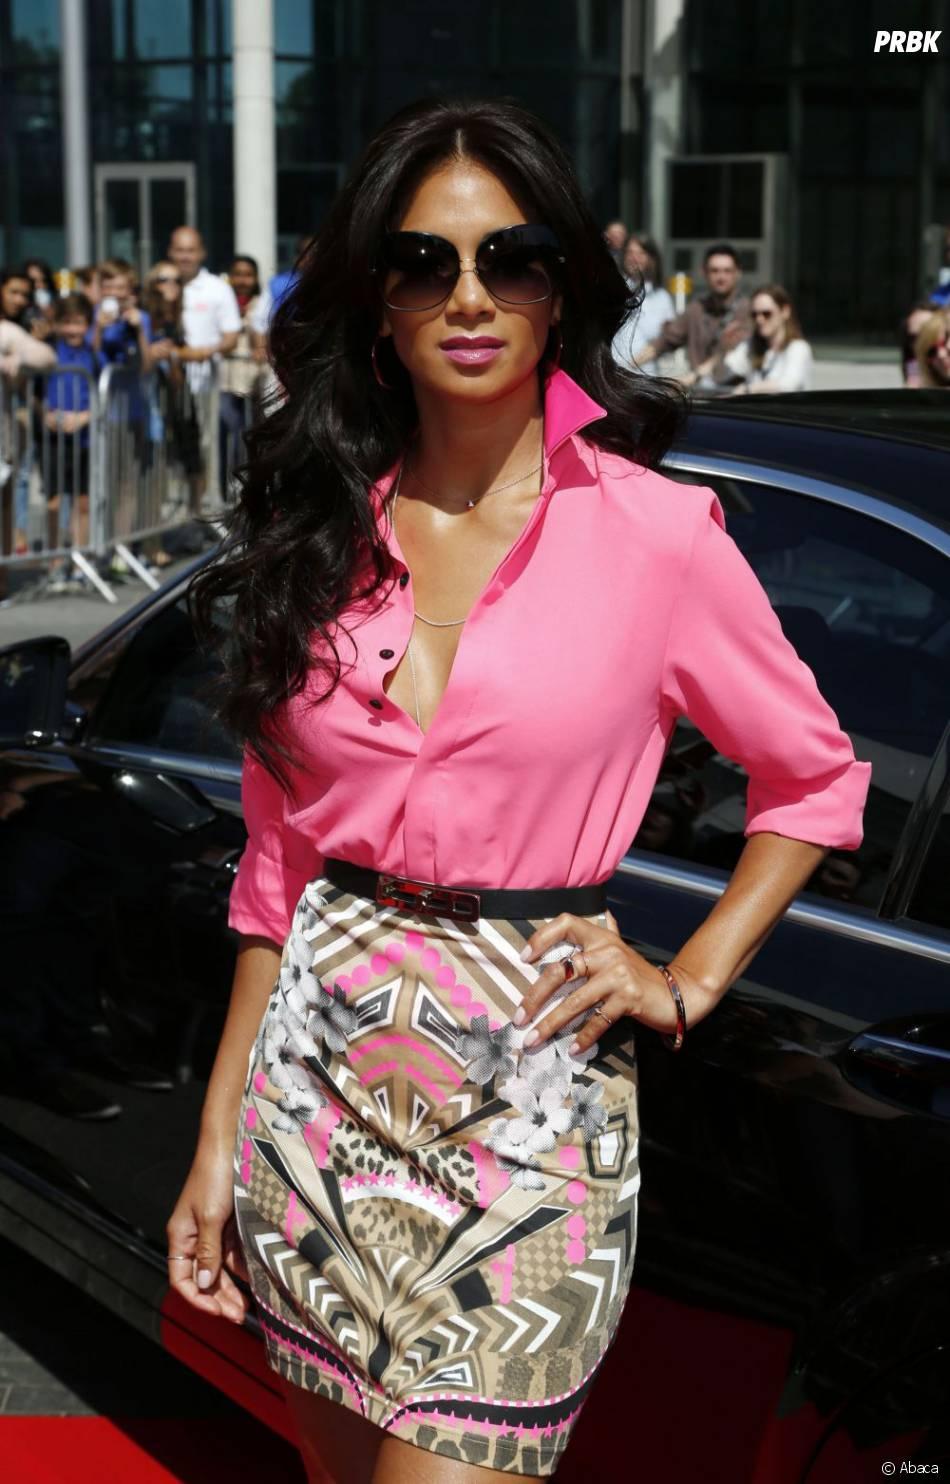 Nicole Scherzinger : mariage imminent avec Lewis Hamilton ?